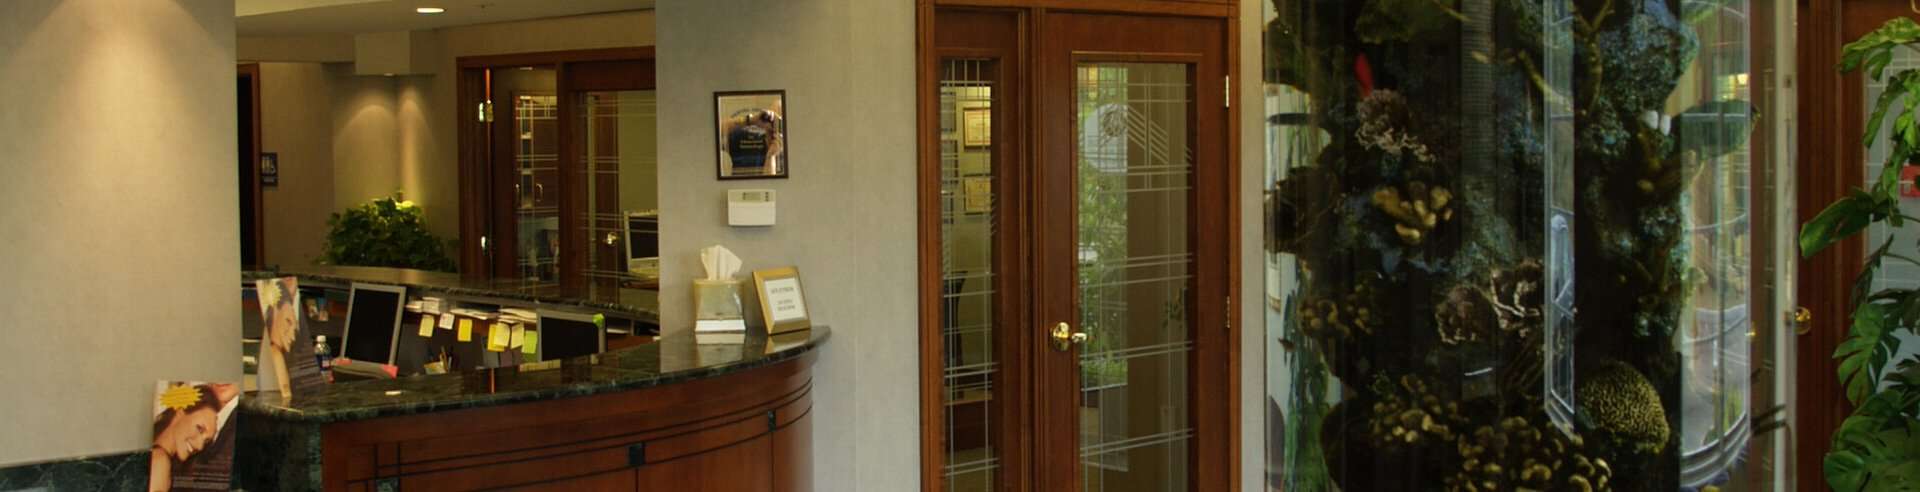 Alex Bell Dental Office Reception Side View